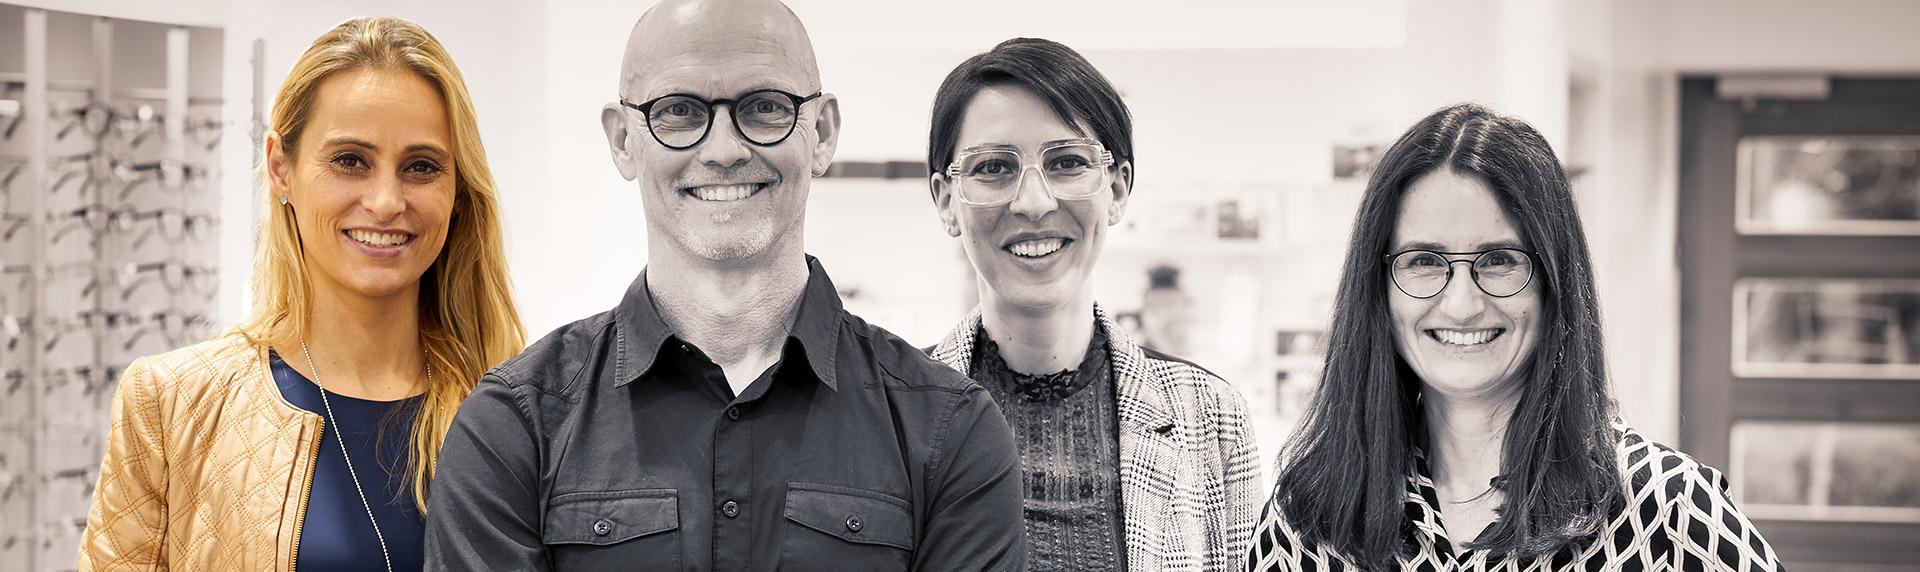 Team der Augenoptiker Optik Meirandres Gauting mit Fokus auf Frau Berner-Burhenne